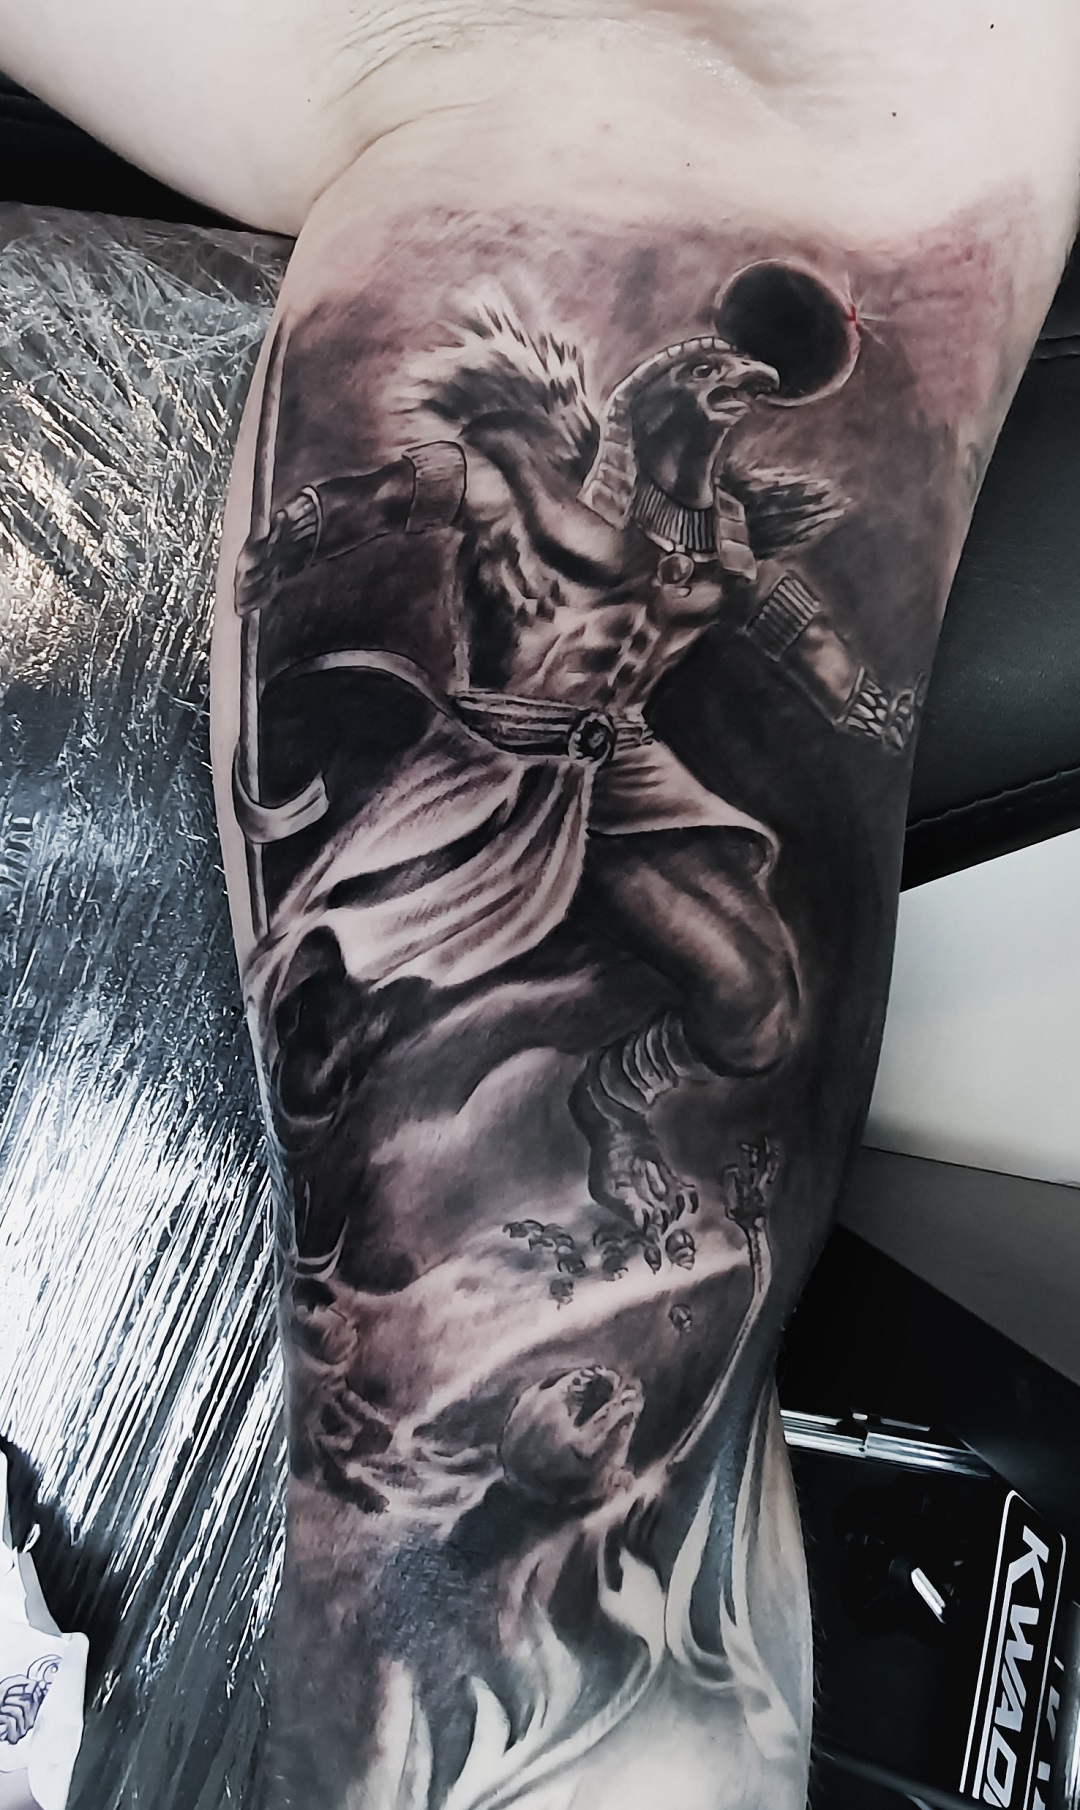 Łódź tatuaże, salon tatuażu Łódź, salon tatuażu w Łódź, salony tatuażu Łódź, studio tatuażu Łódź, studio tatuażu w Łodzi, tatuaz Lodz, tatuaze Lodz, tatuaż Łódź, tatuaże Łódź, dobry salon tatuażu Łódź, gdzie zrobić tatuaż w Łodzi